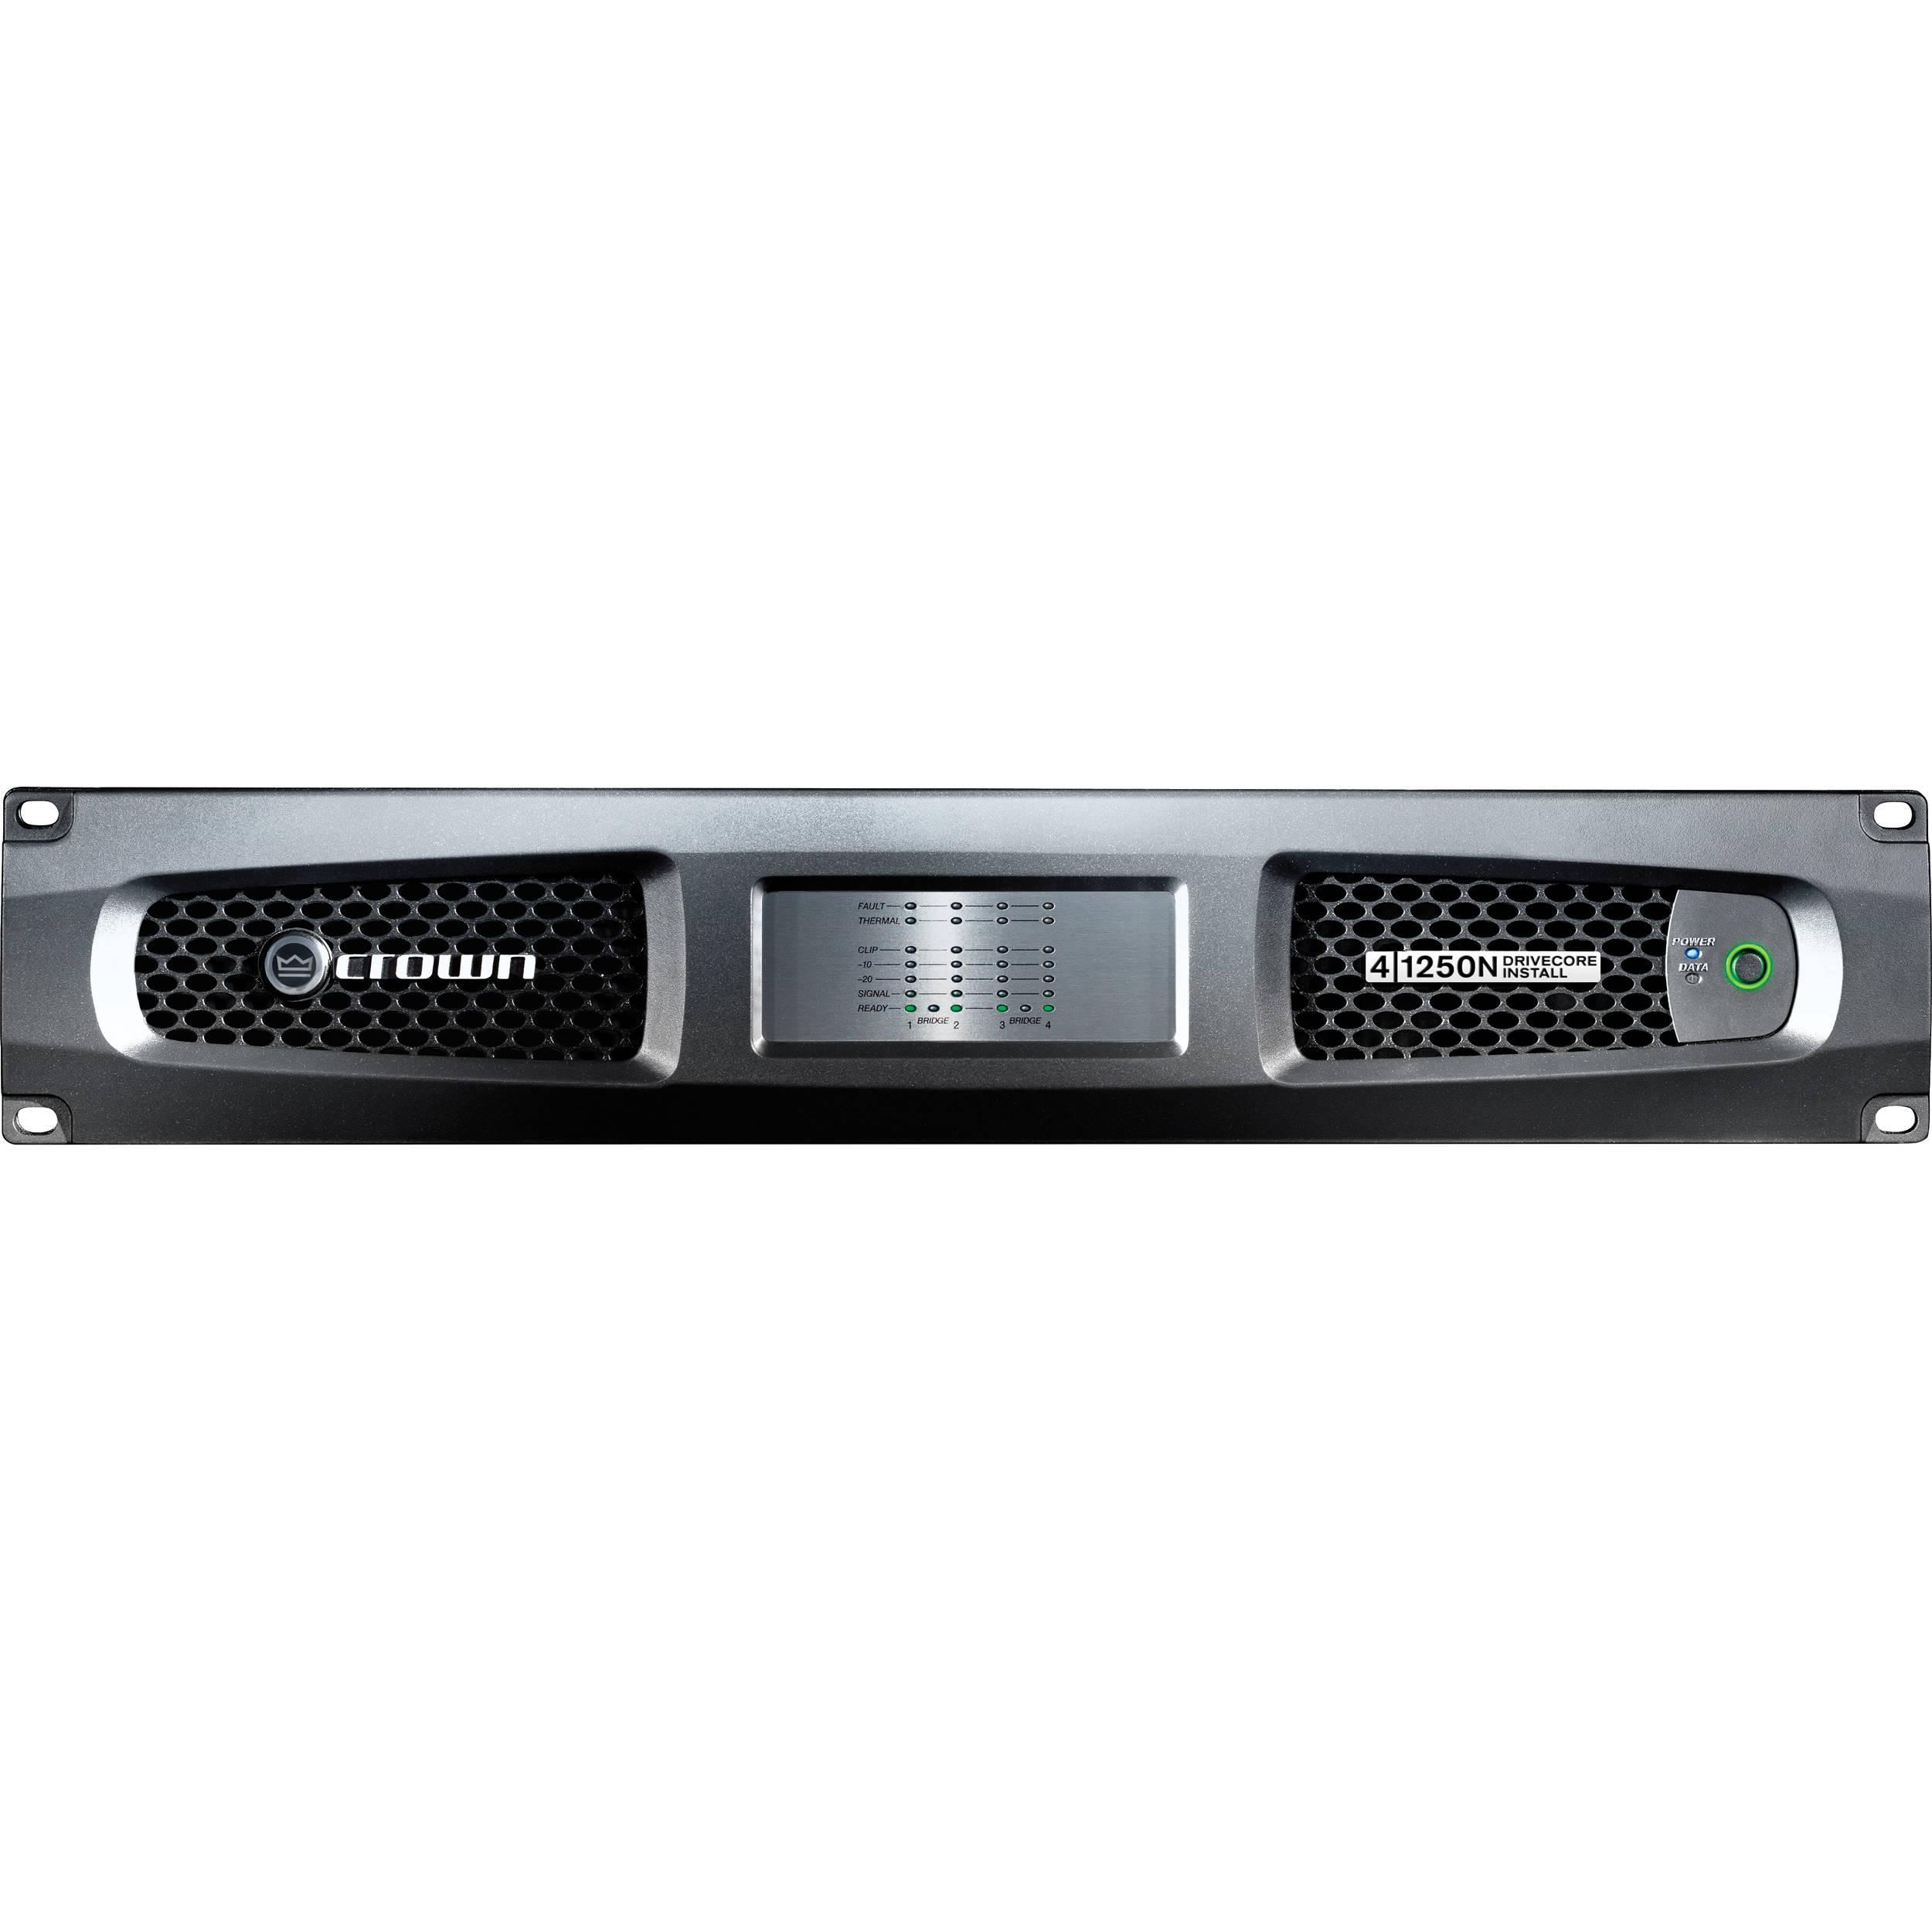 crown audio dci 4 1250n four channel power amplifier dci 41250n. Black Bedroom Furniture Sets. Home Design Ideas